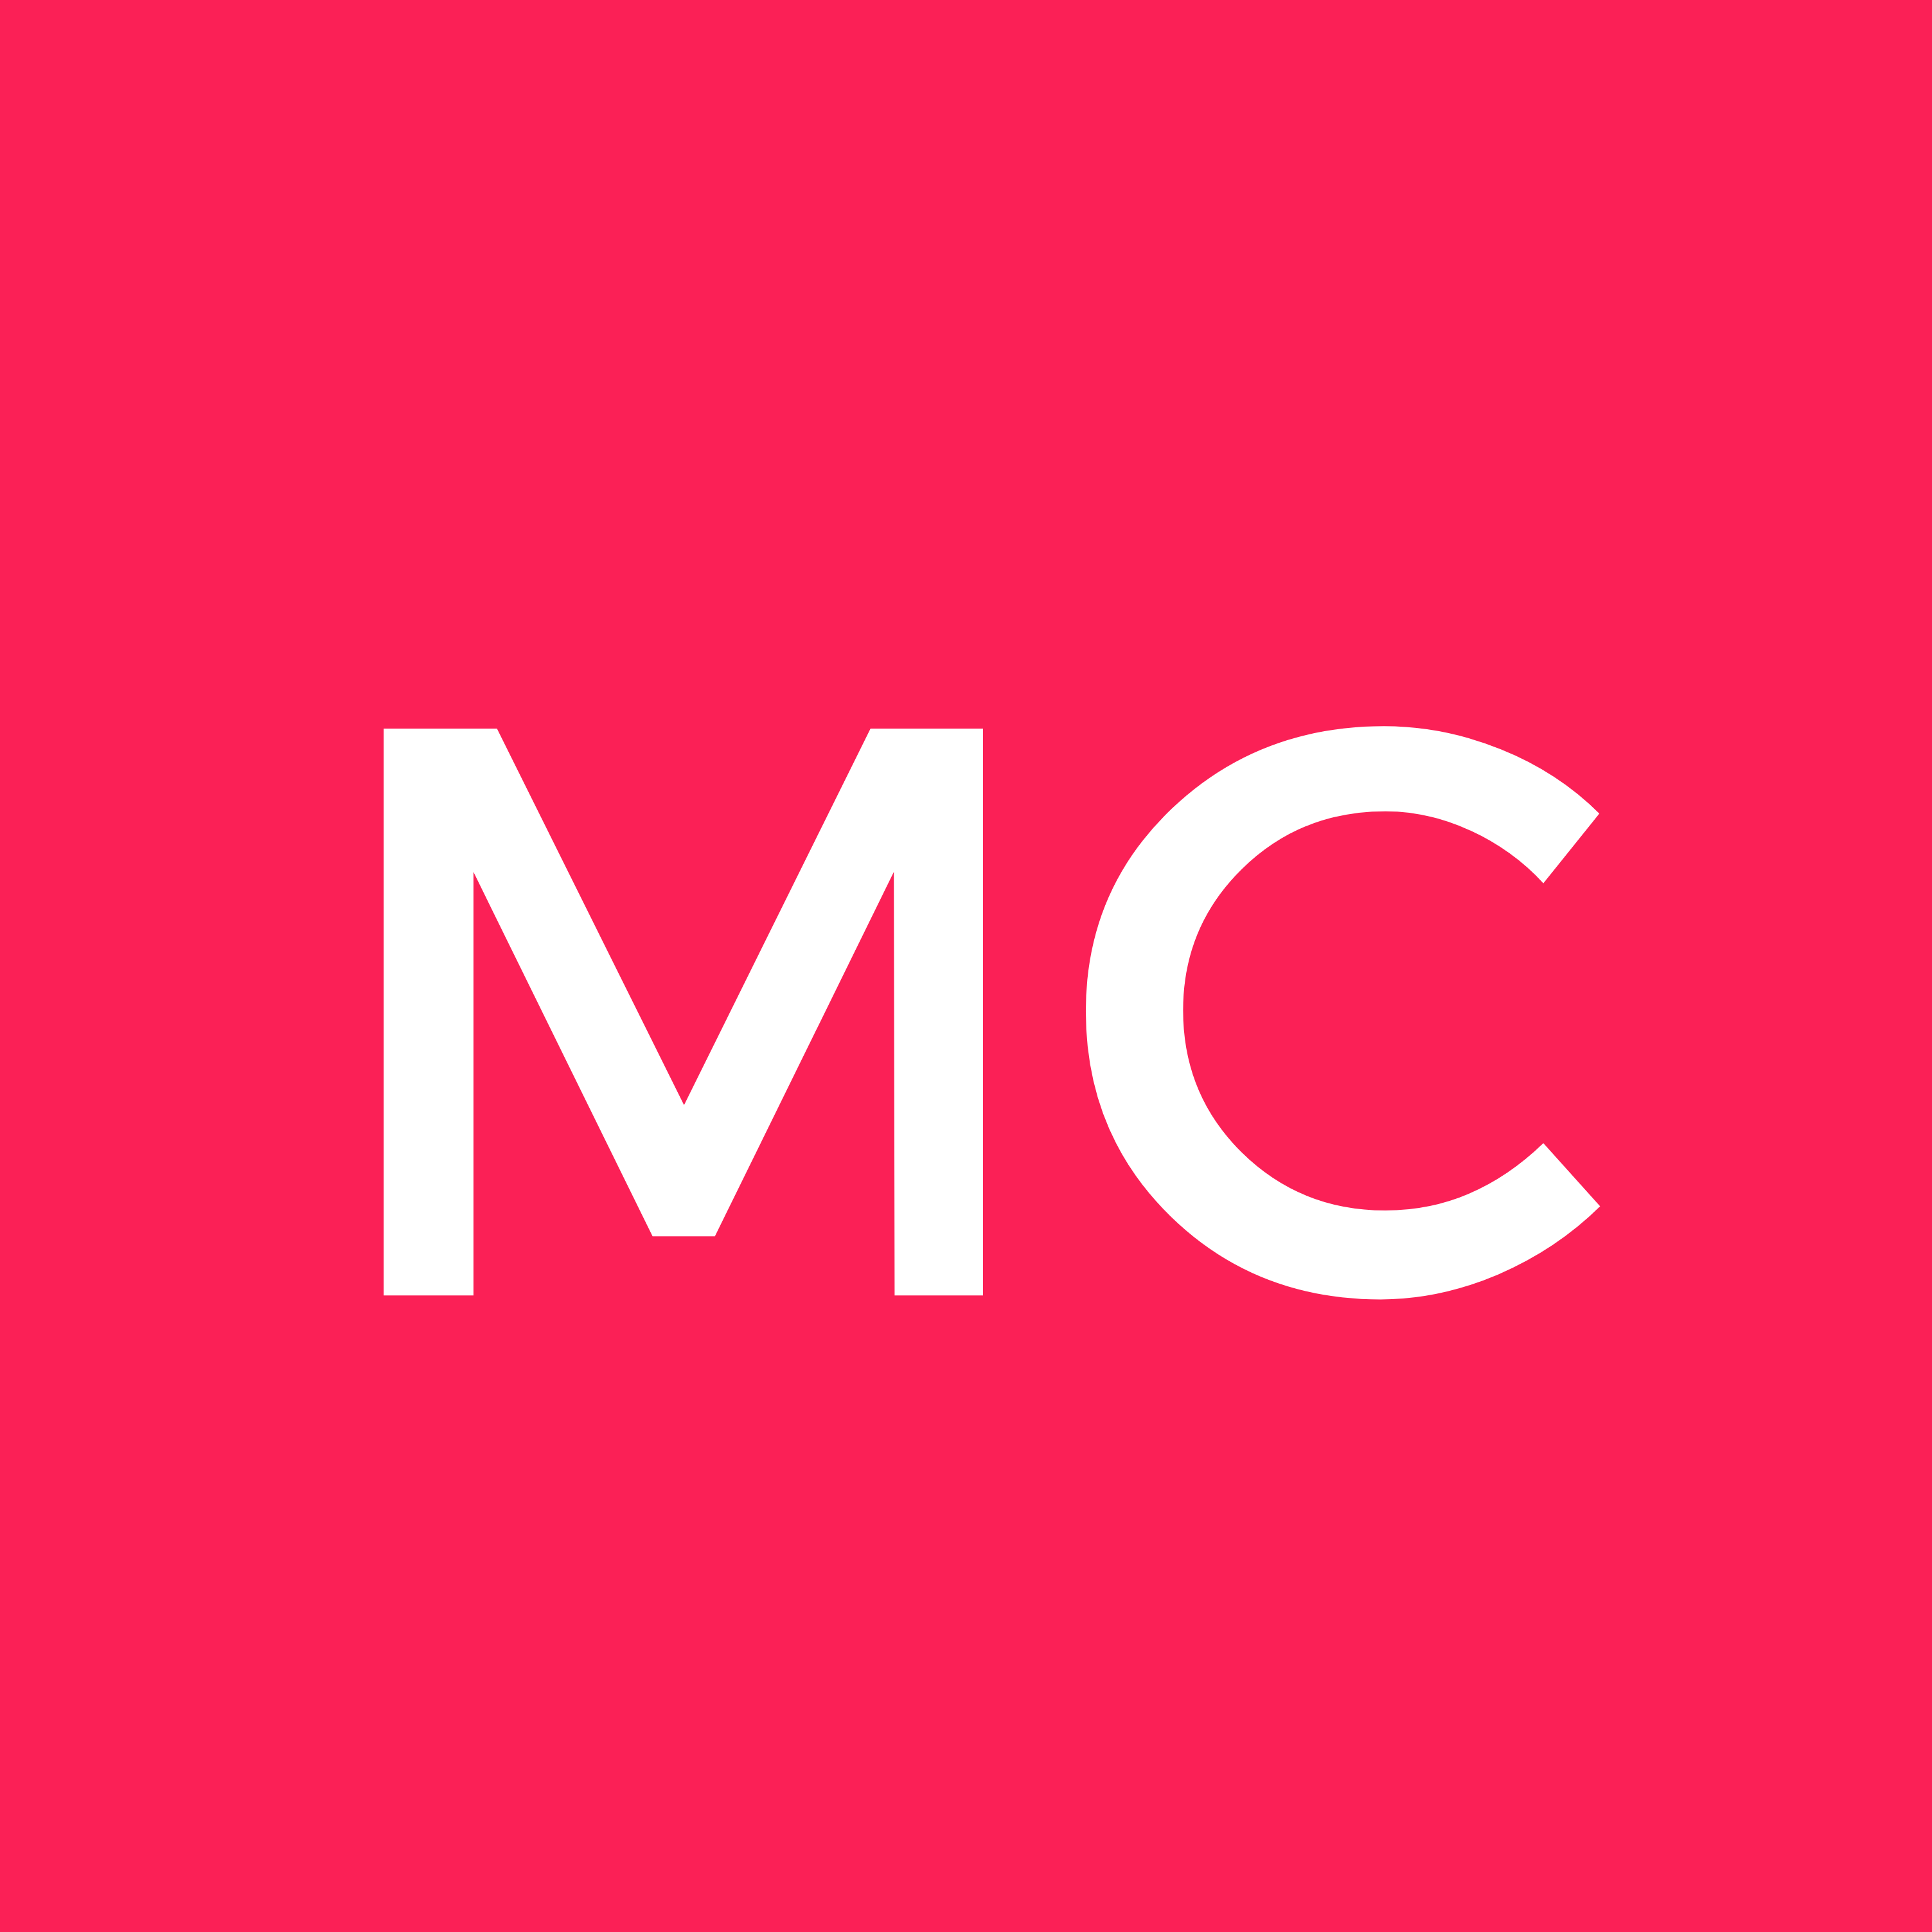 MC Square Sandbox - 2021-05-21T220414.161